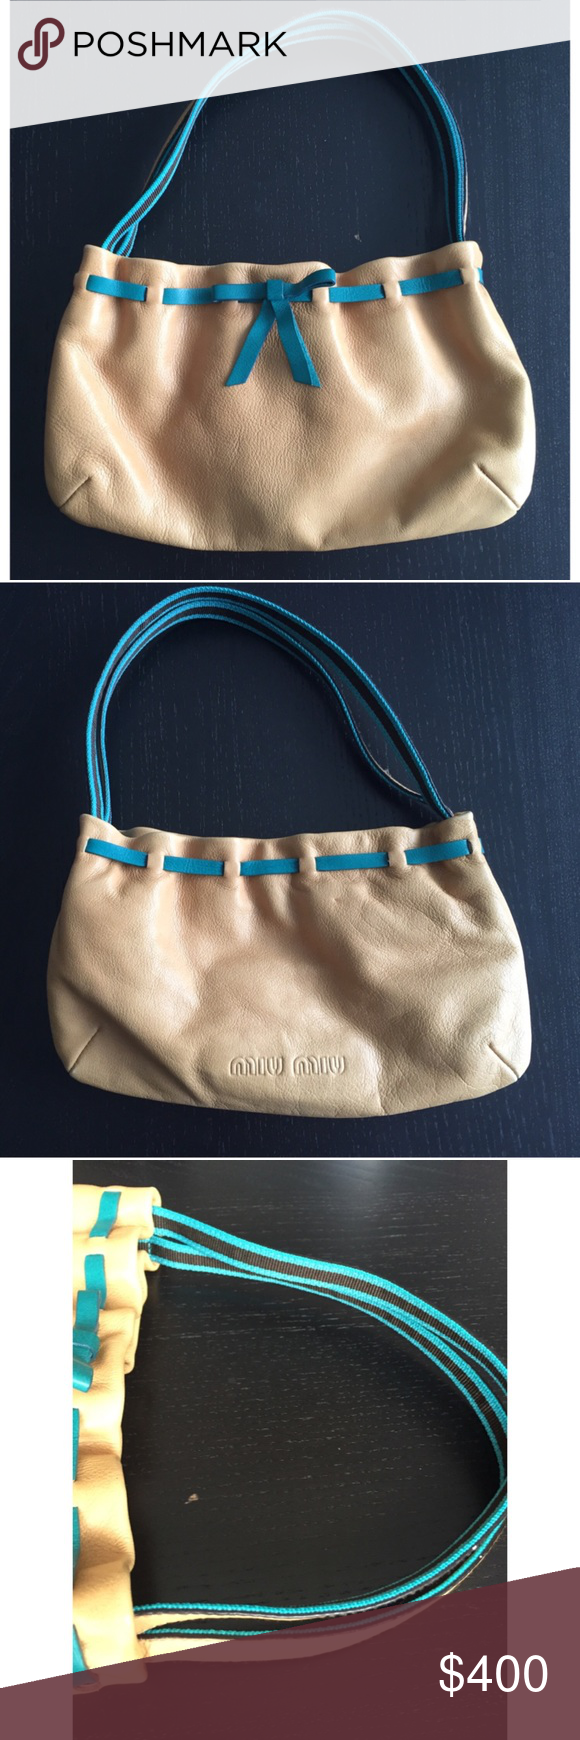 🤑 Flash Sale! Rare Miu Miu Mini Handbag NWOT a23ae0ecfe